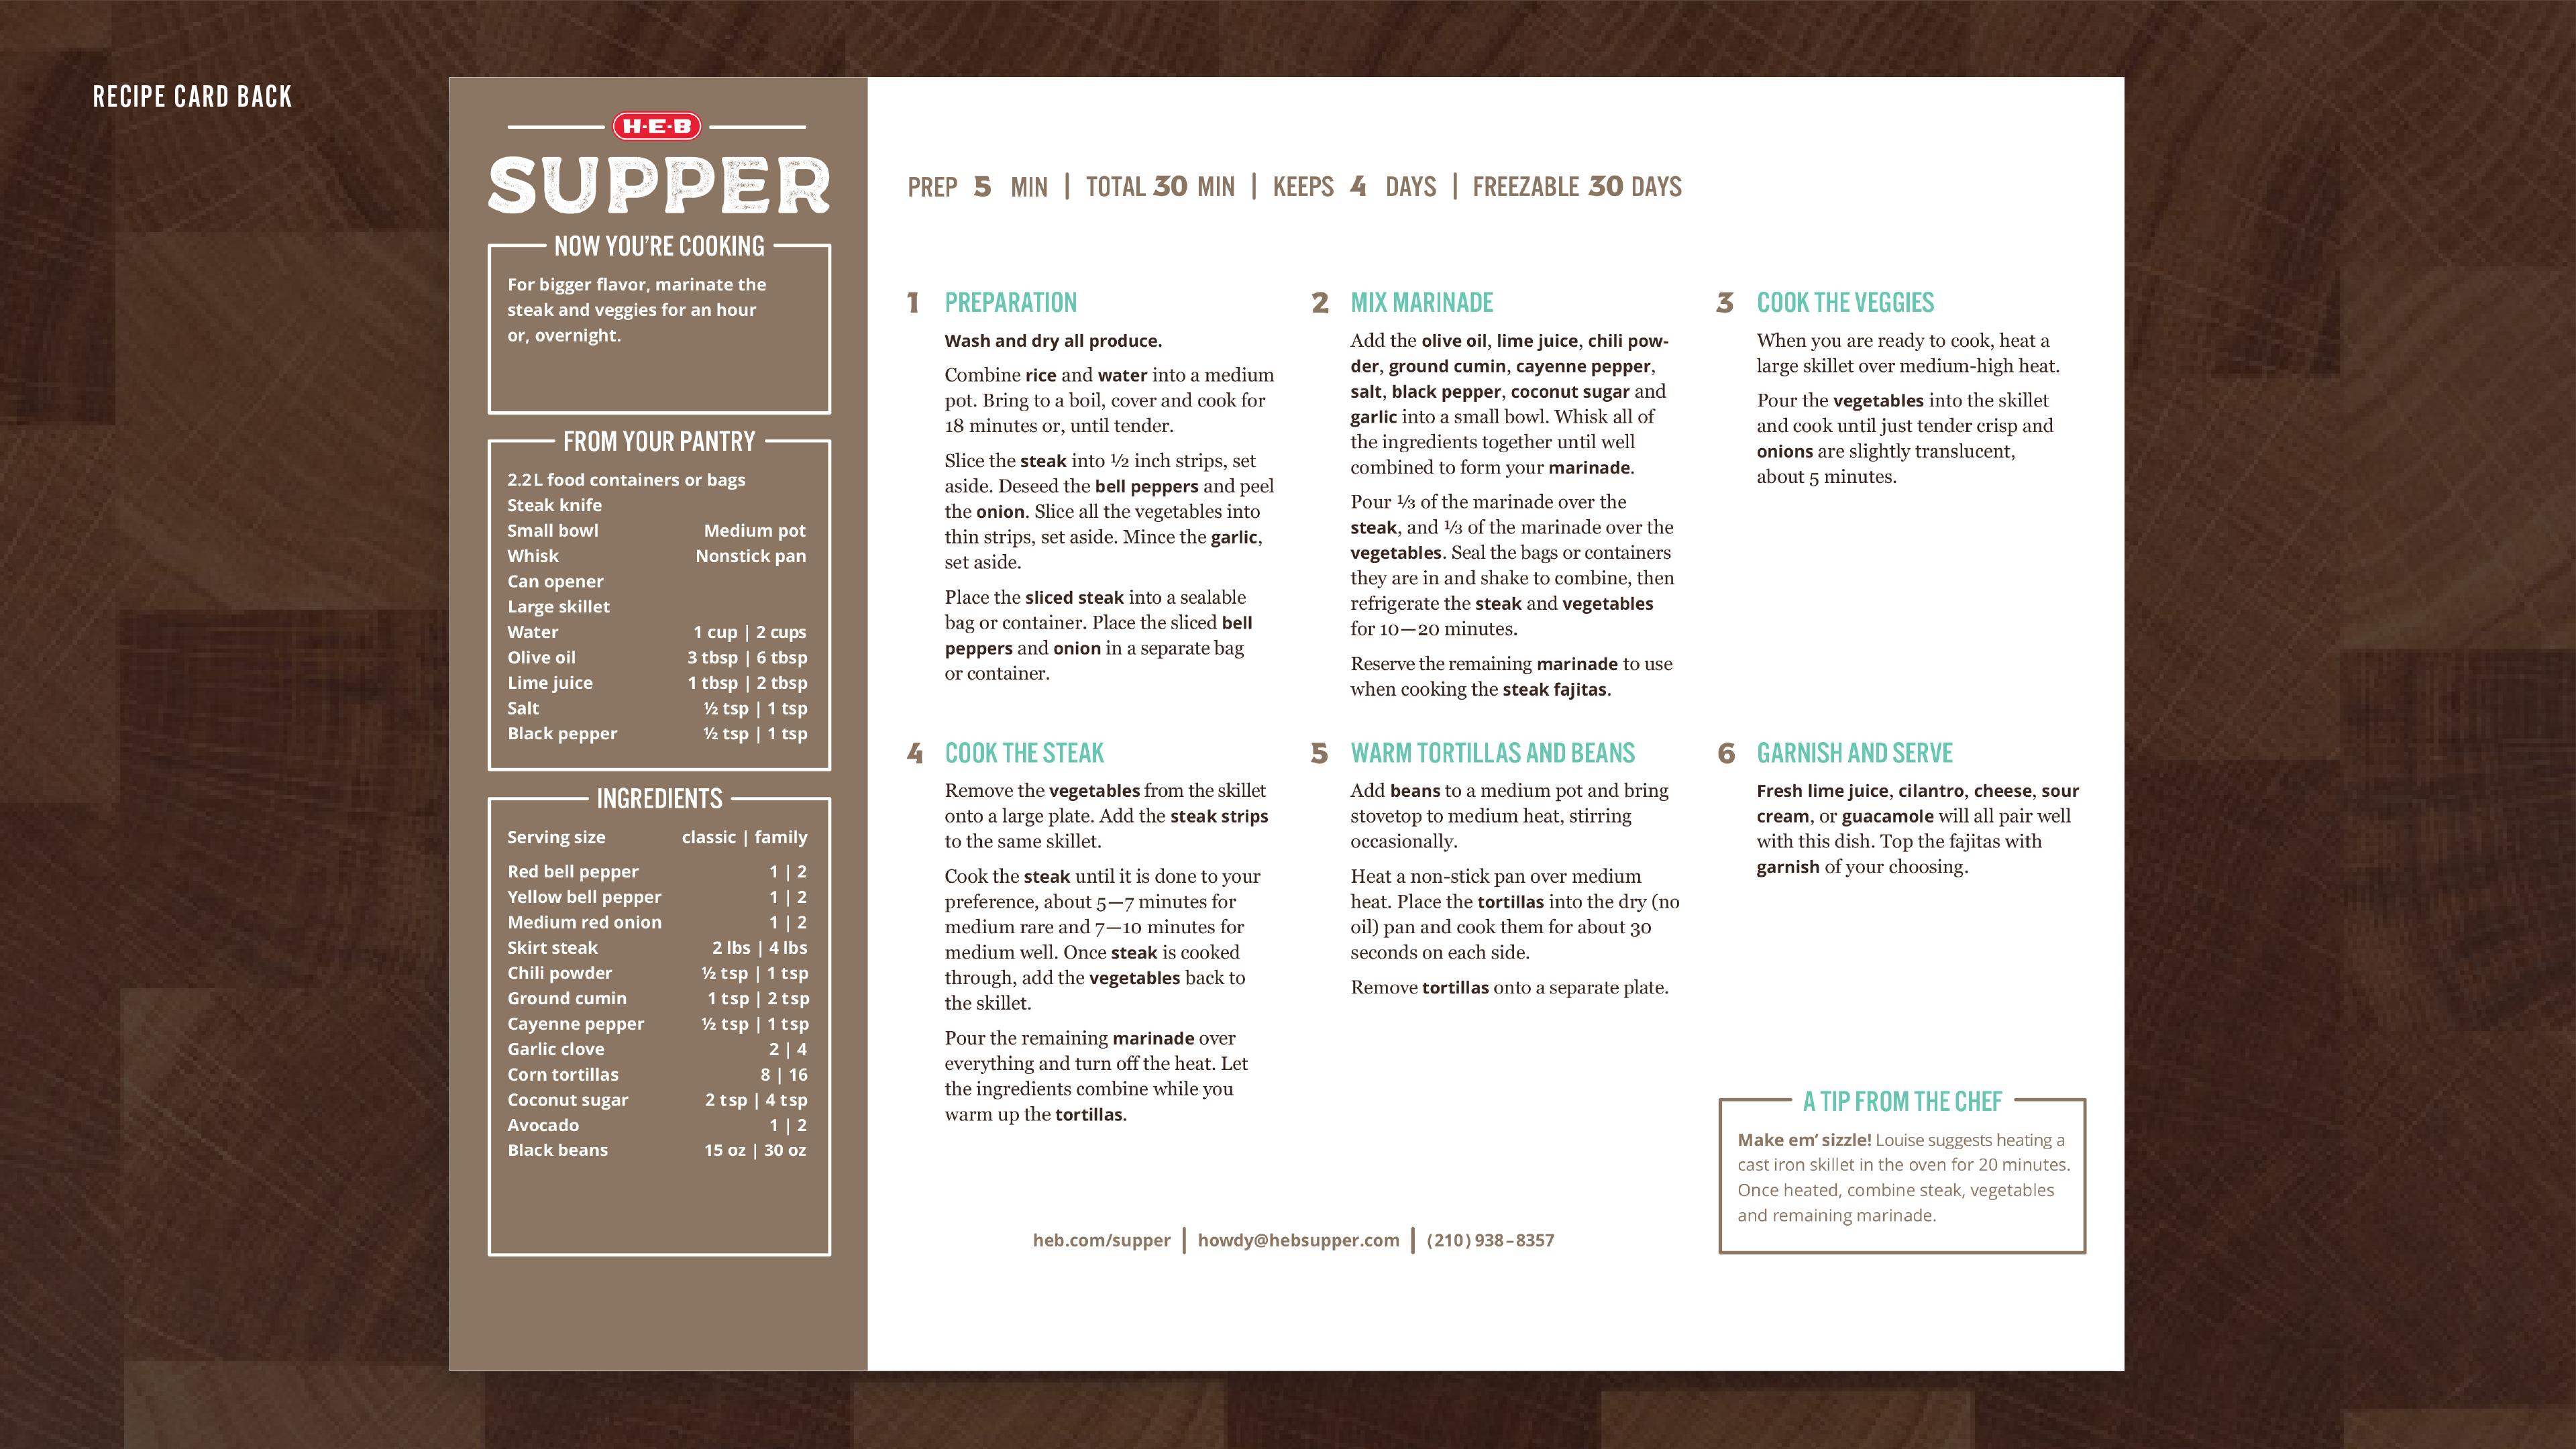 heb_supper_recipe_card_2.0_backArtboard-1-copy-14@2x